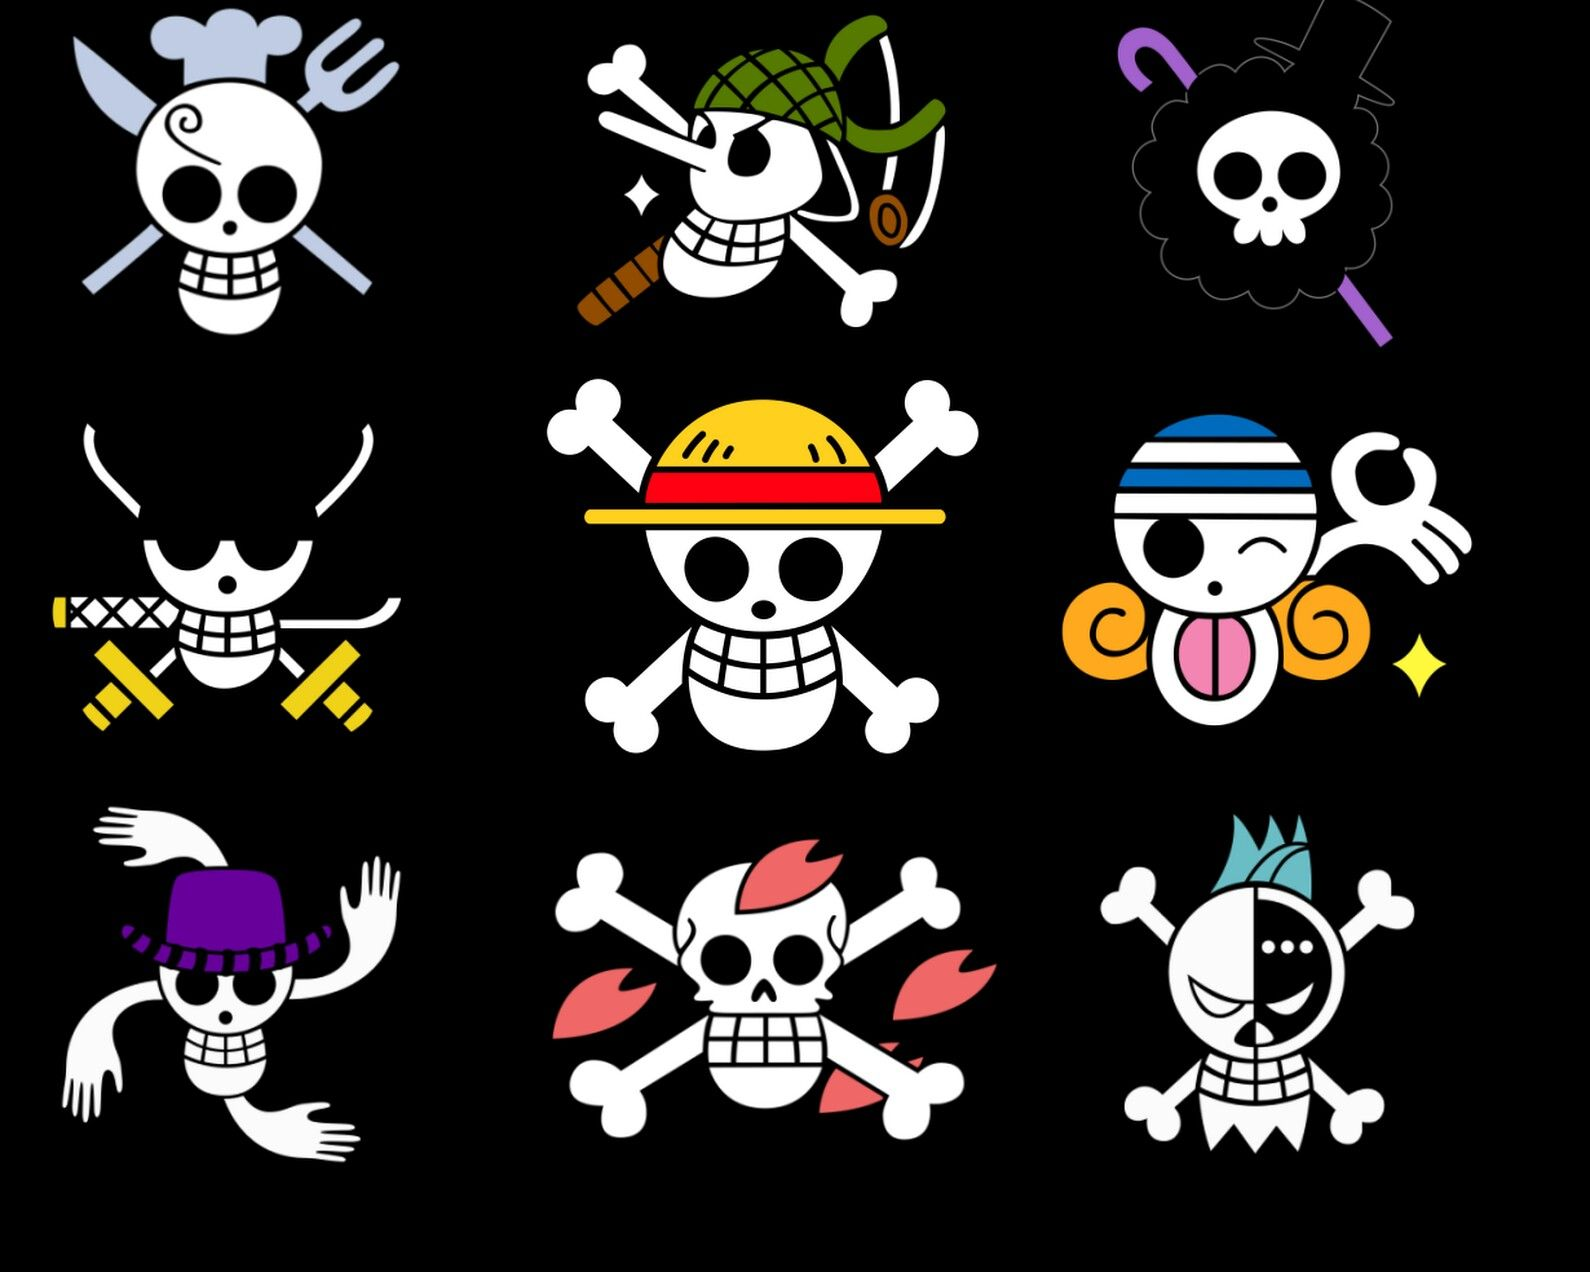 One Piece Symbol One Piece Pinterest Symbols